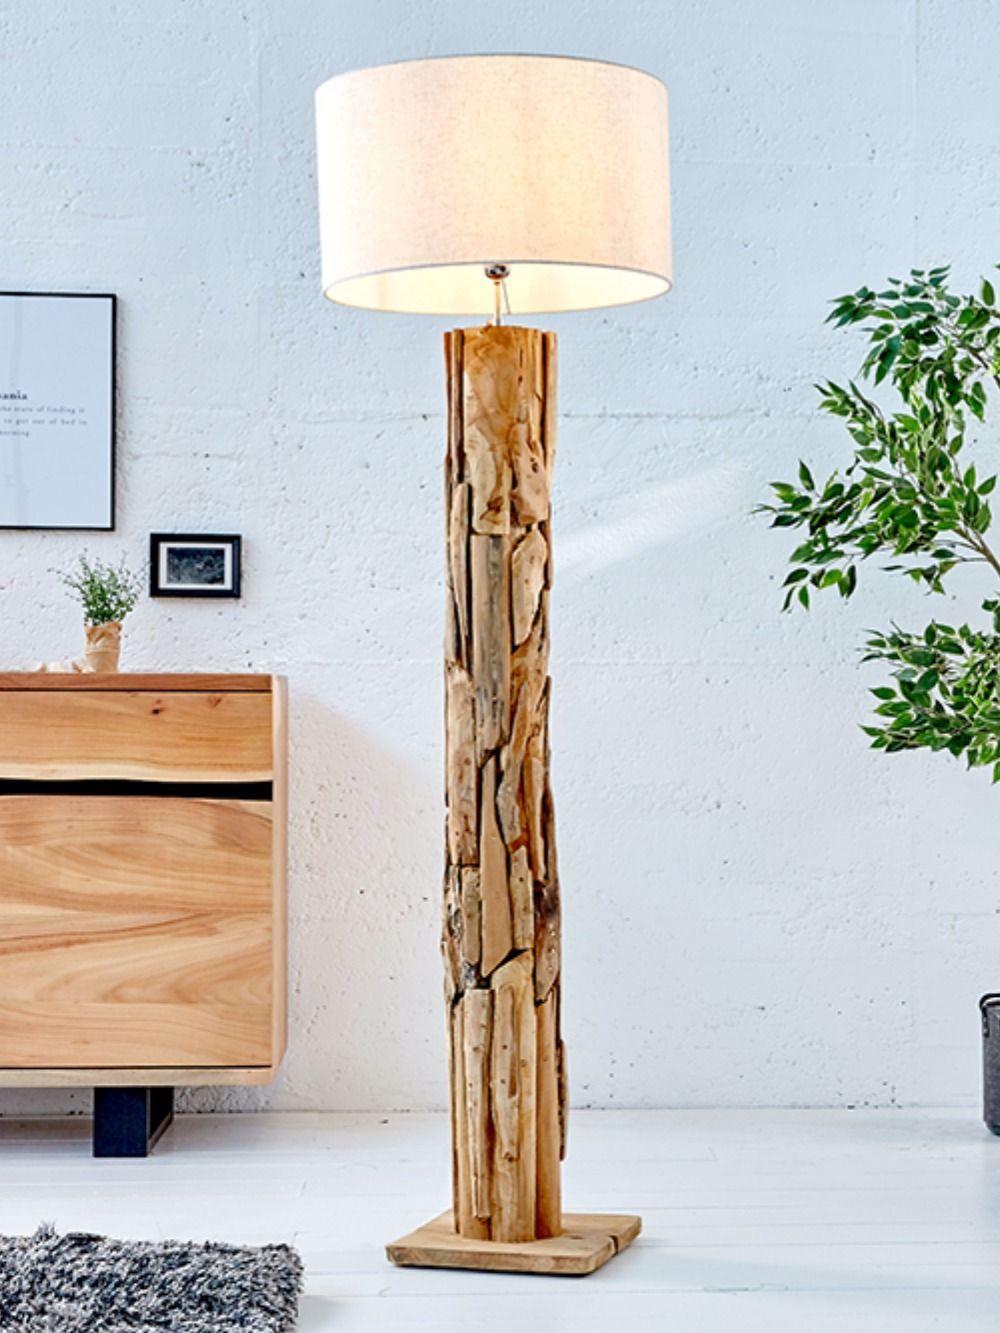 Hohenverstellbare Teakholz Stehlampe Roots 175cm Beige Treibholz Lampe In 2020 Wood Floor Lamp Floor Lamp Lamp